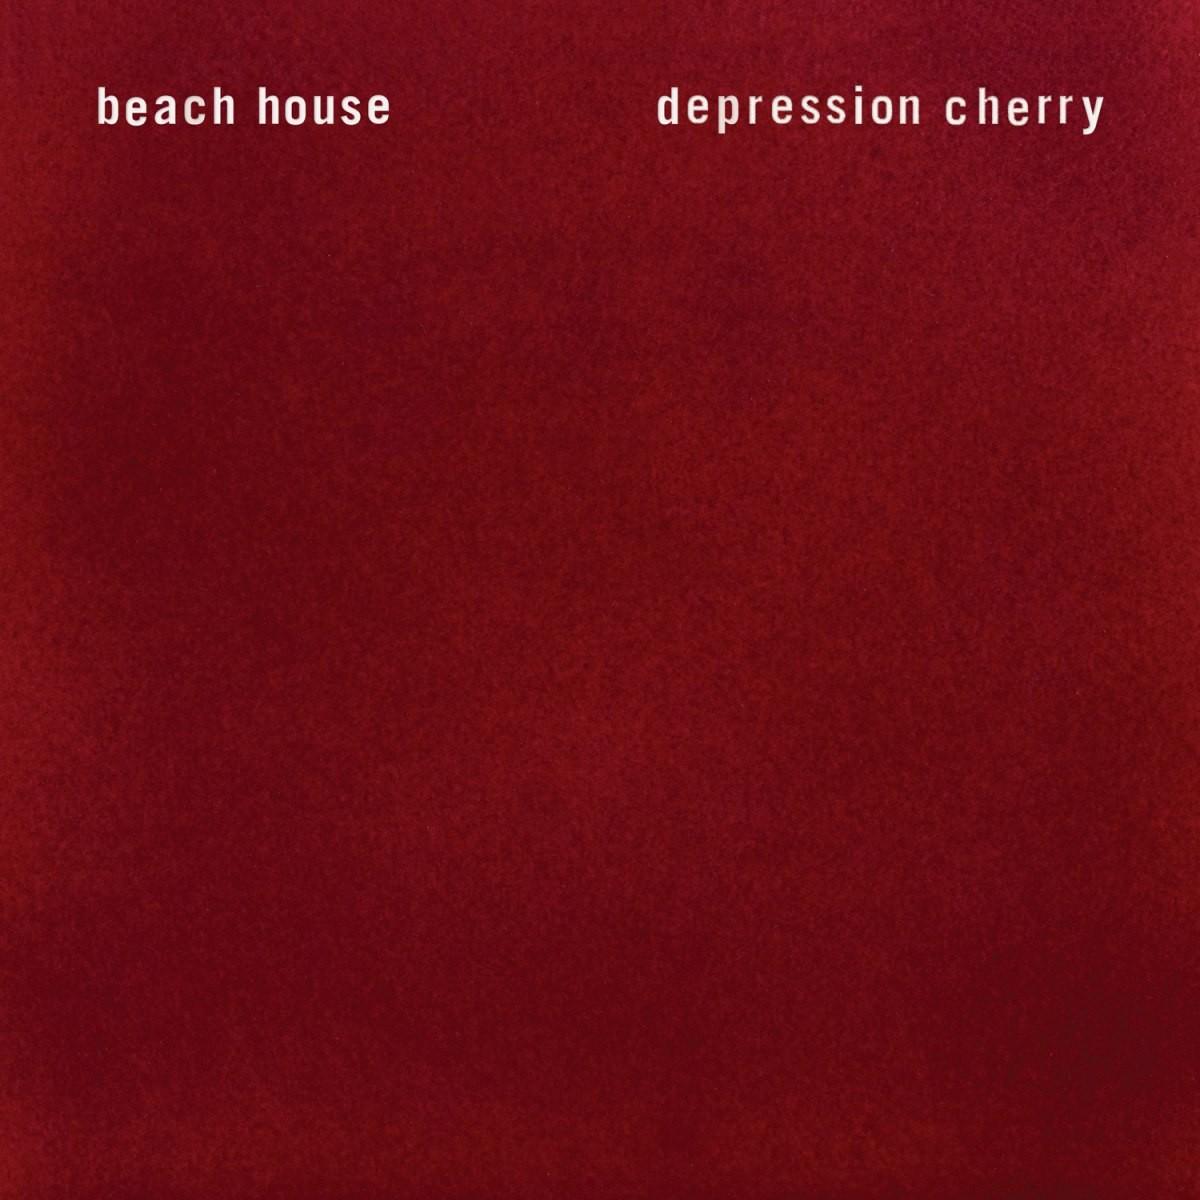 Beach House Depresssion Cherry